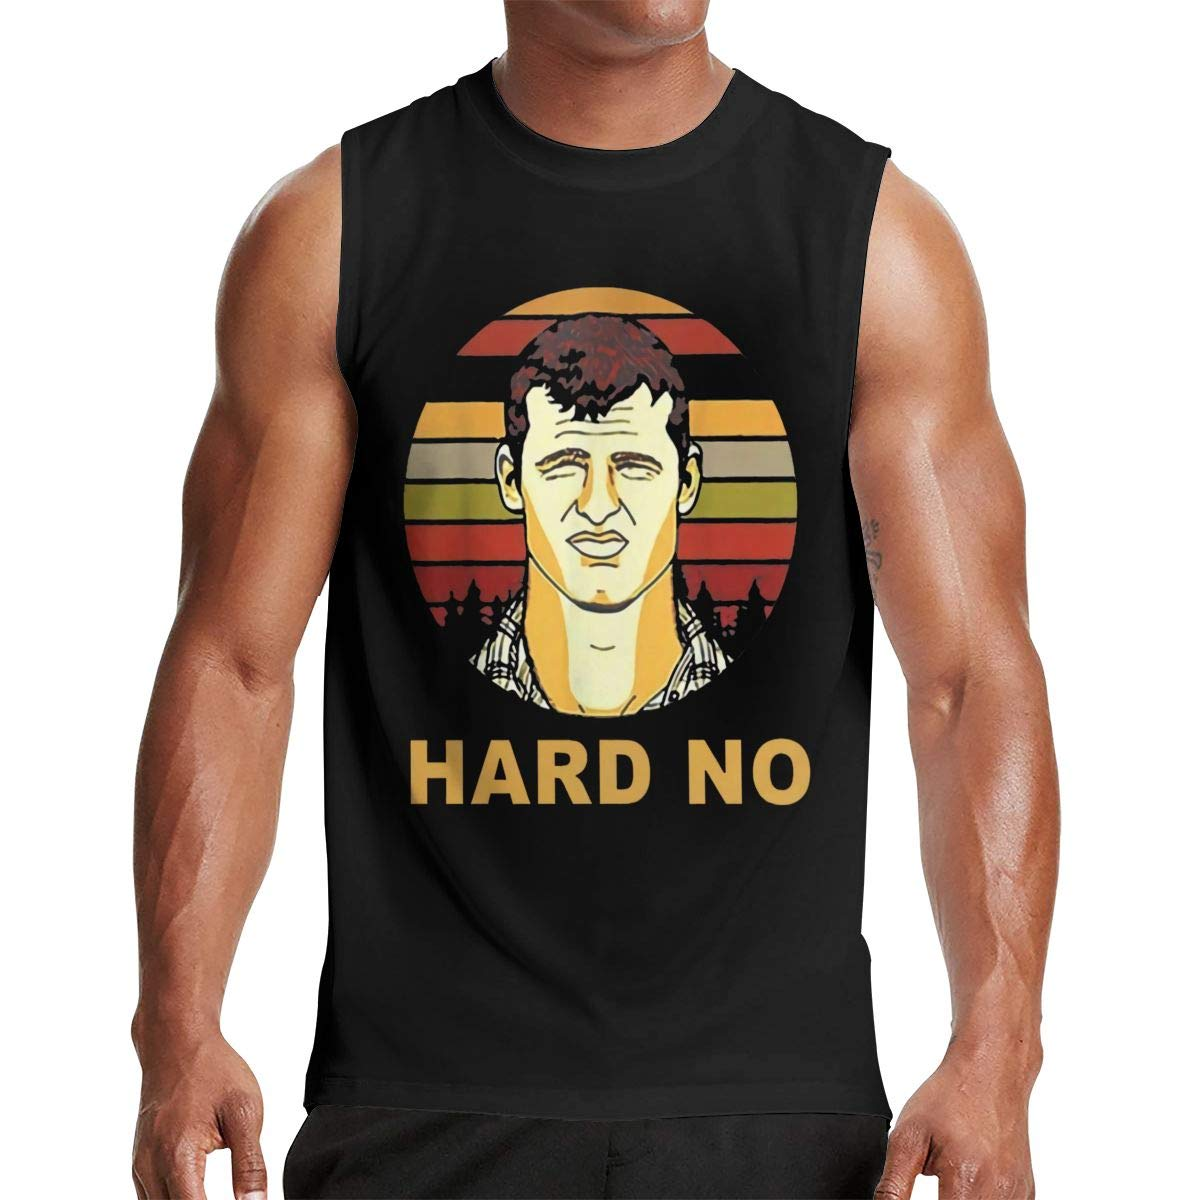 Thomlarryca Hard No Letterkenny S Gym Muscle T Shirt Classic Athletic Sleeveless T Shi